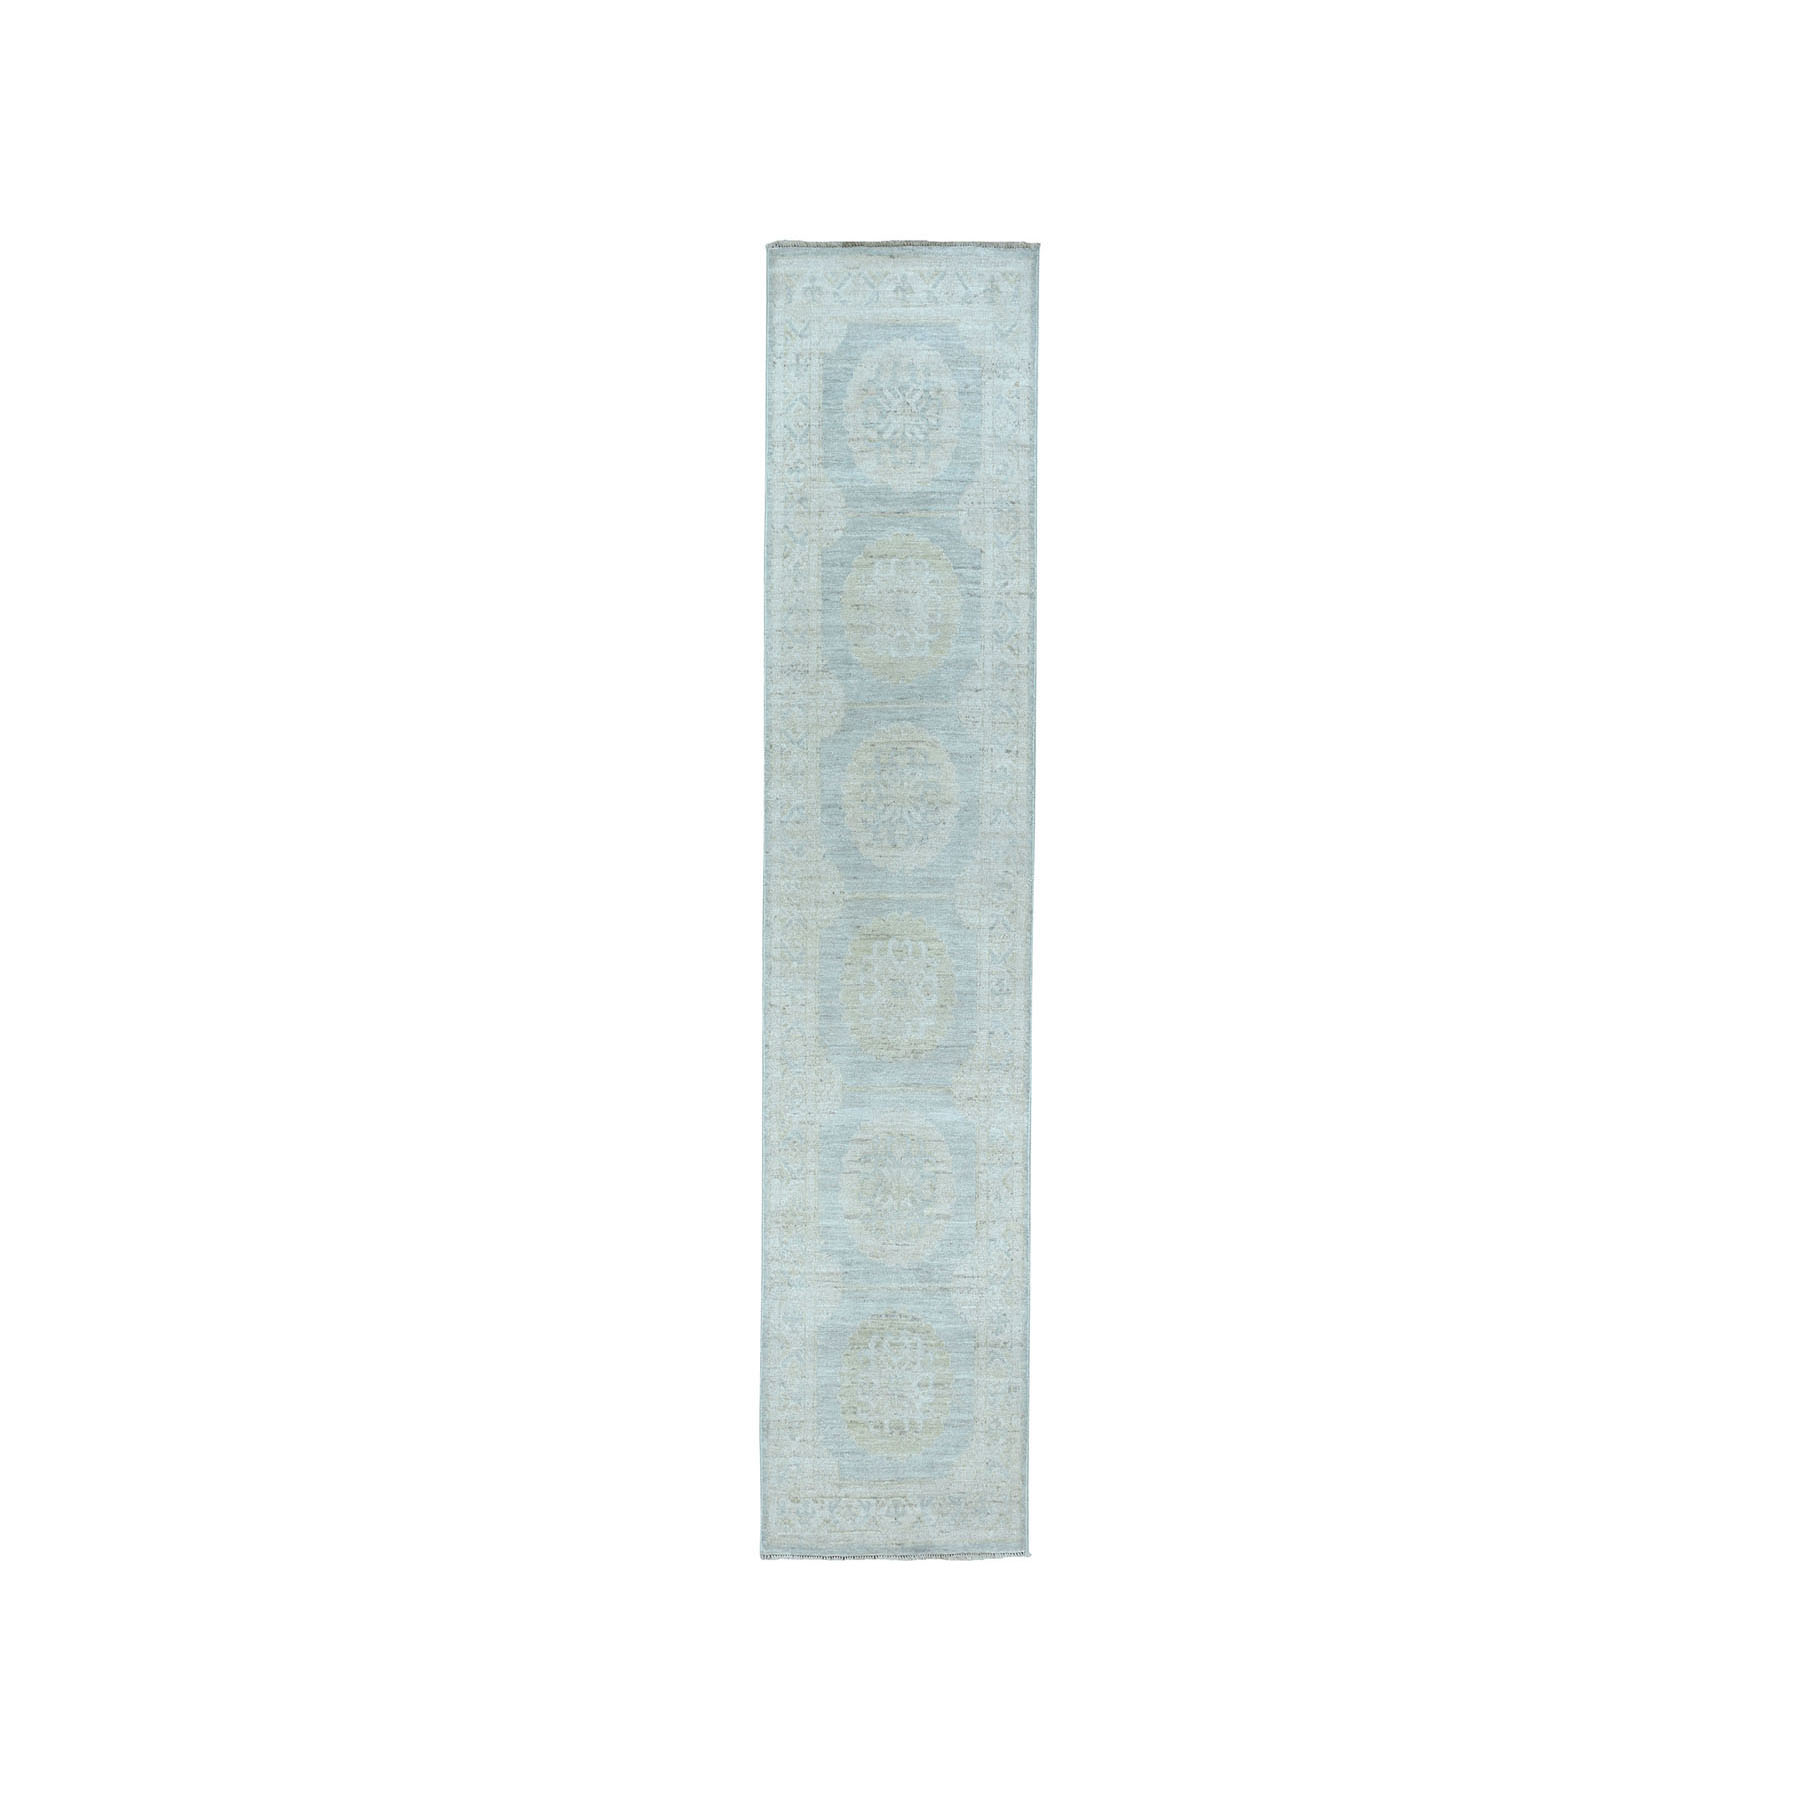 "2'5""x9'5"" White Wash Peshawar Pure Wool Hand-Knotted Oriental Runner Rug"